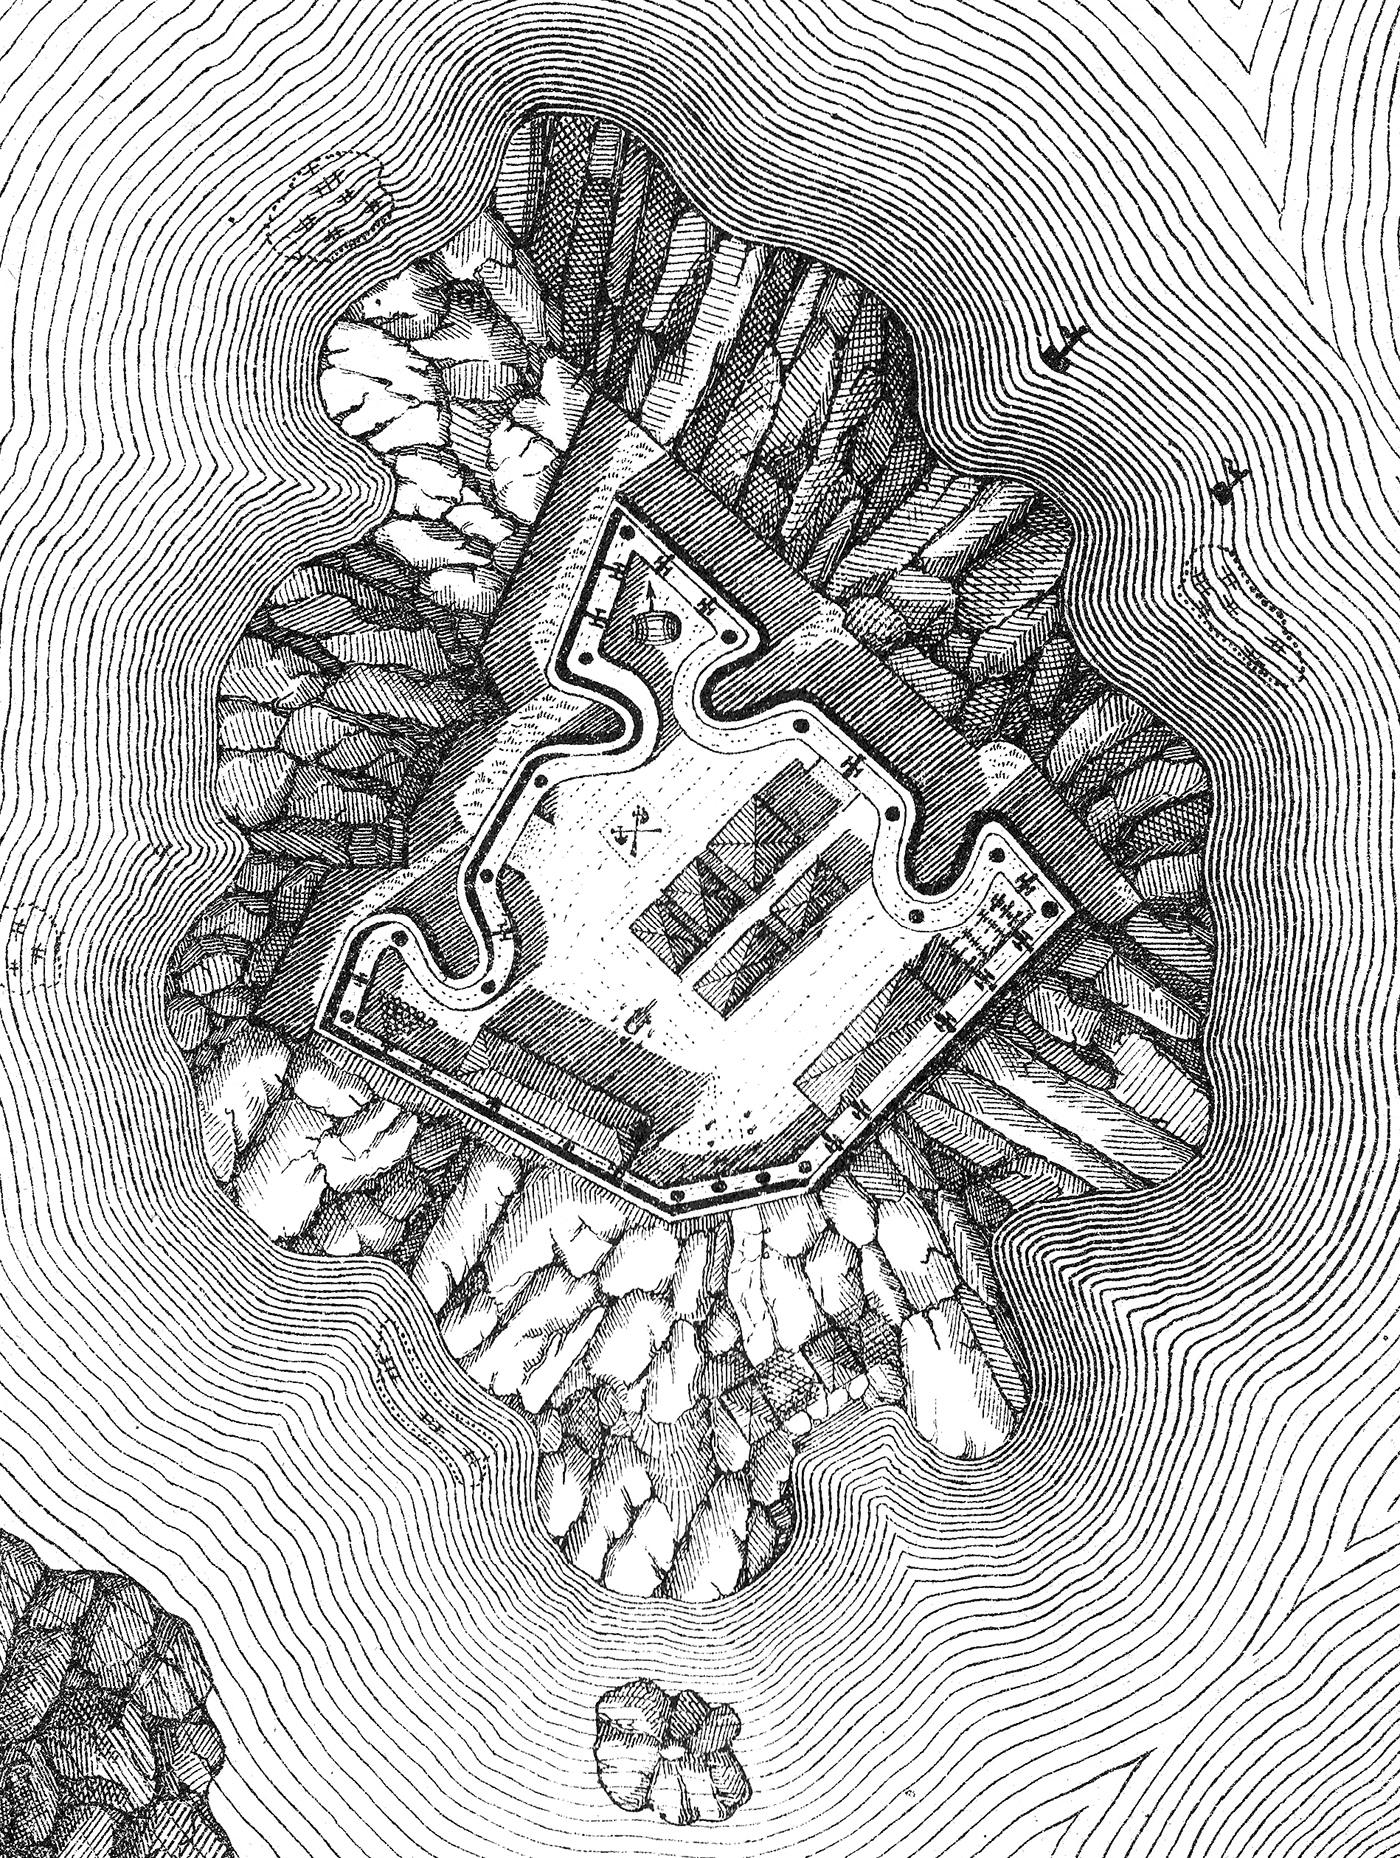 book hand-drawn illustrated map Maps illustration restoration black and white black ink